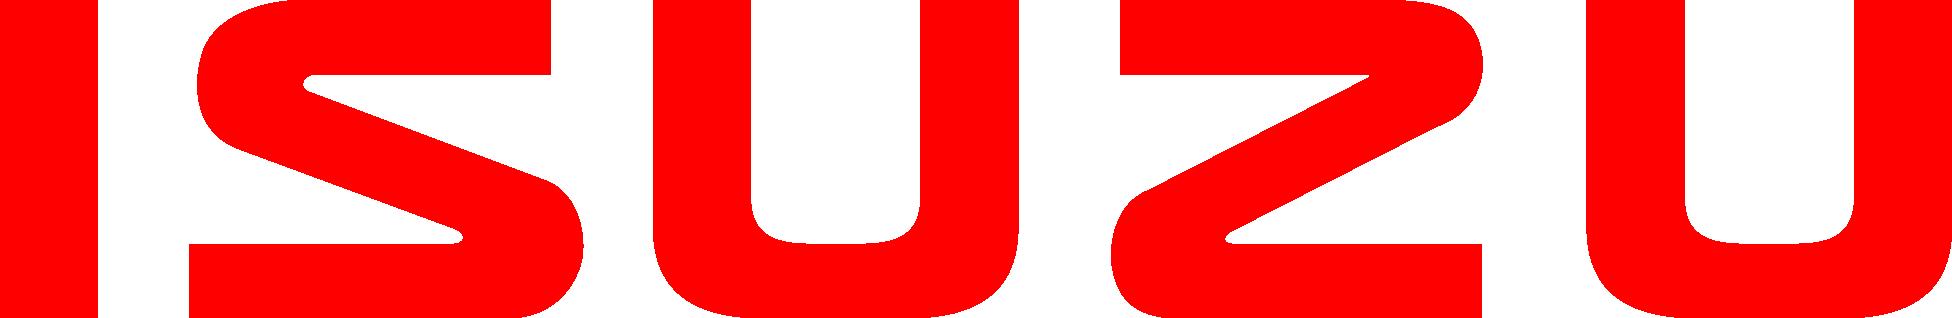 Isuzu Motors Logo png